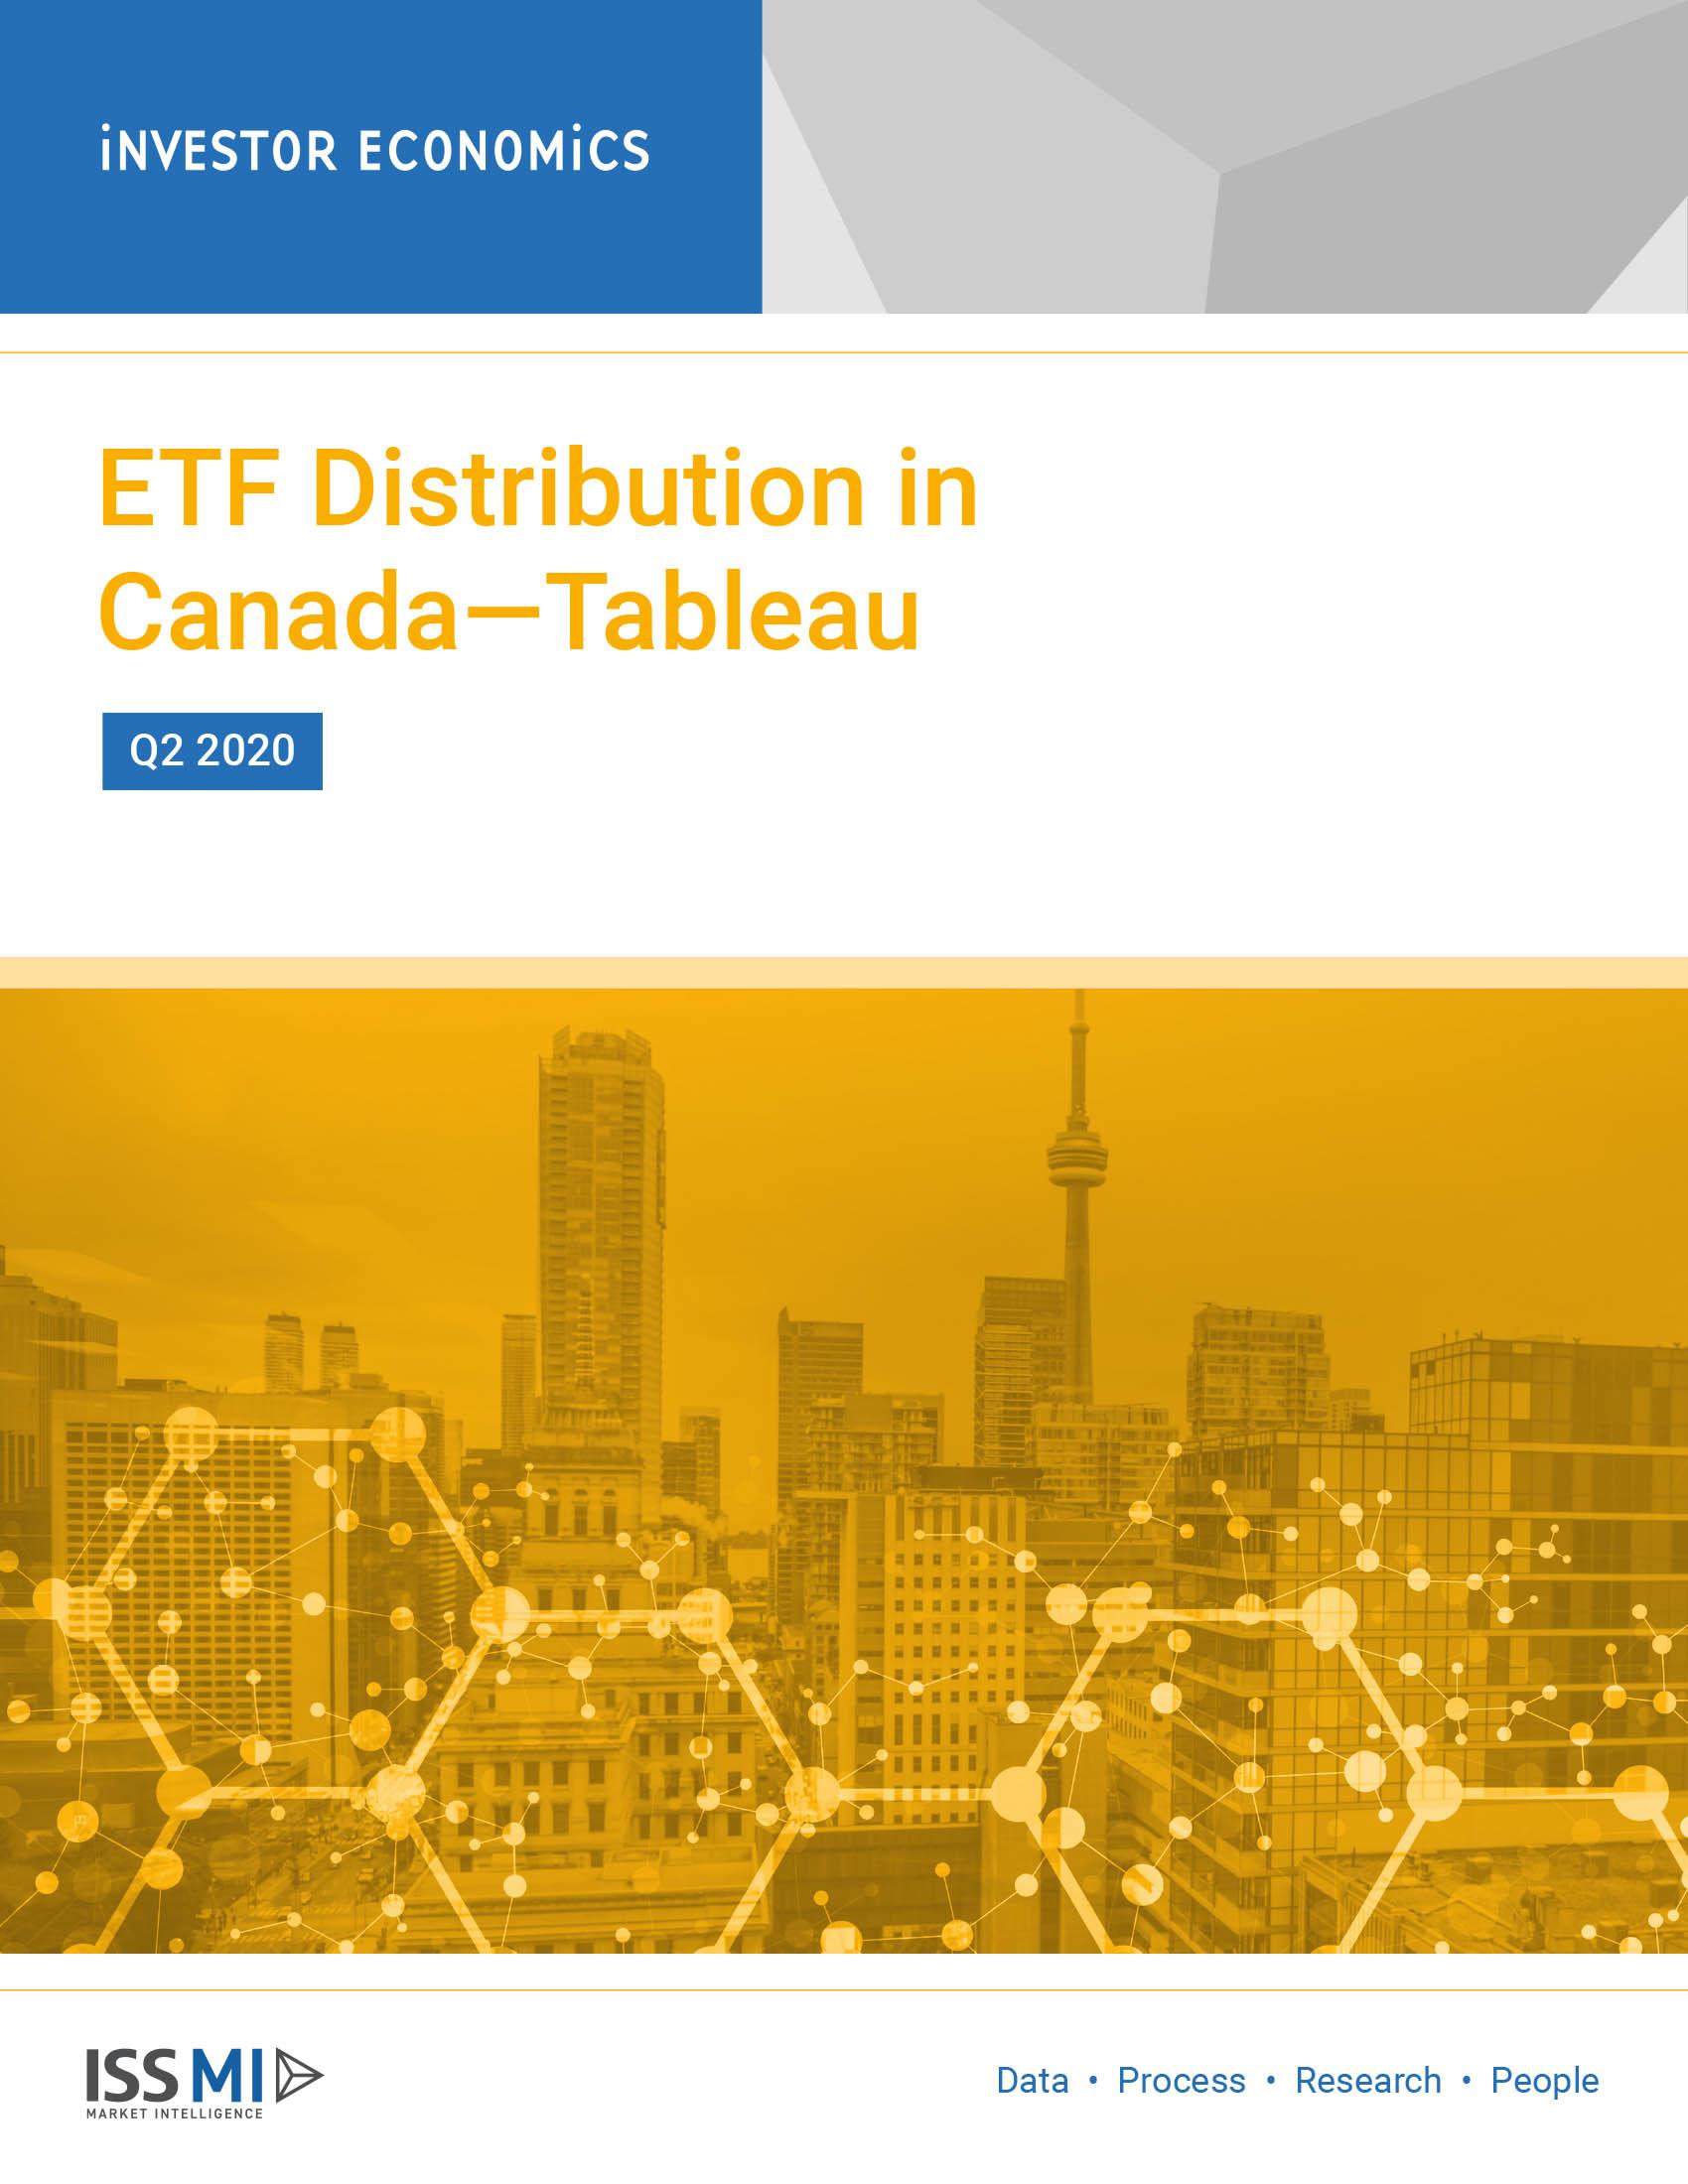 ETF Distribution in Canada—Tableau Q2 2020